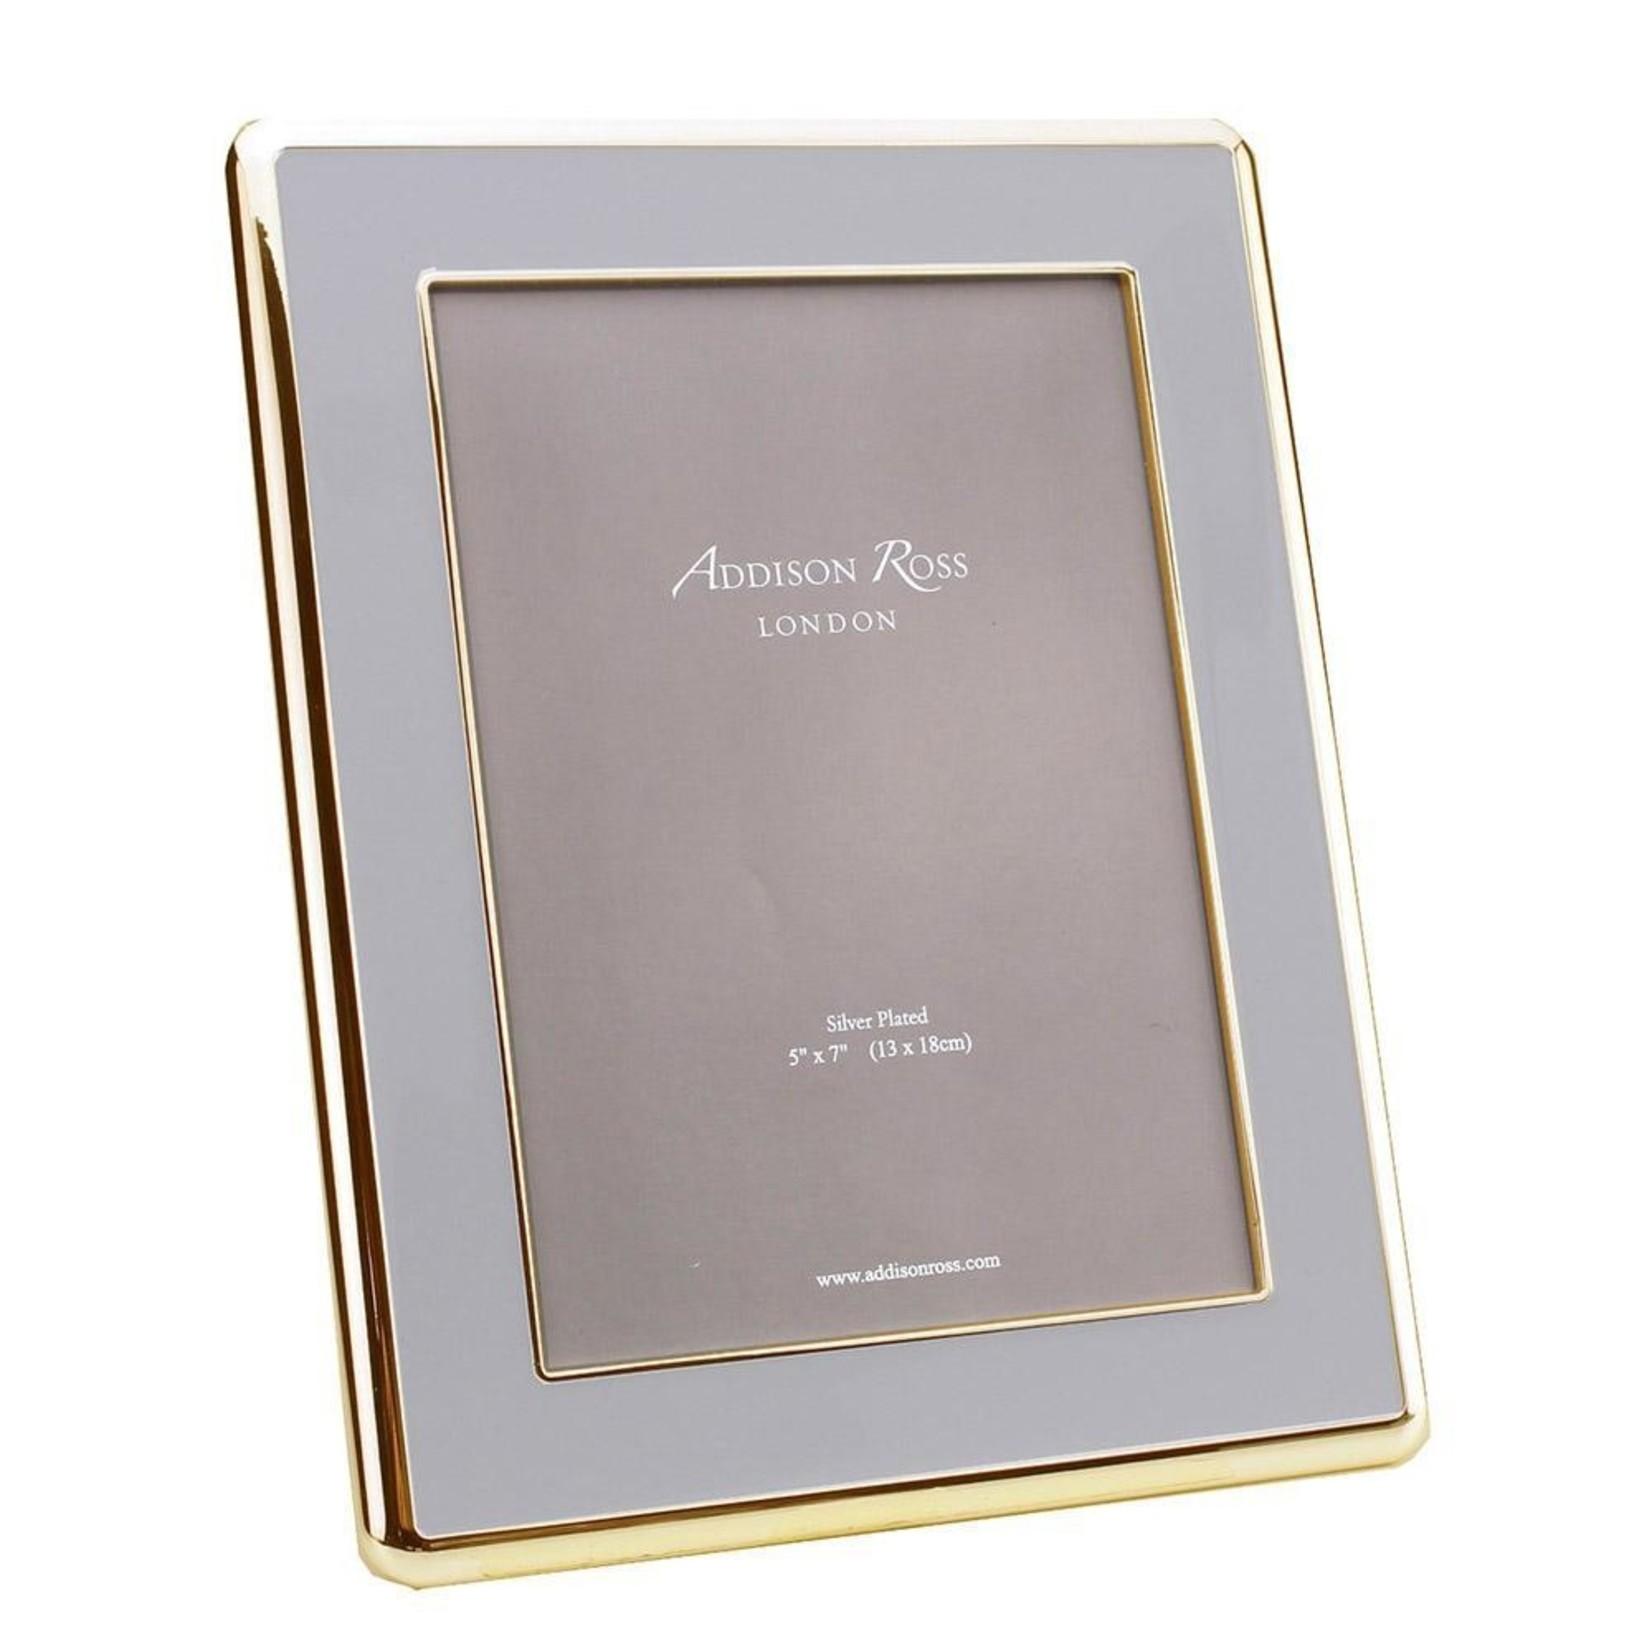 Addison Ross Colored Enamel & Gold Curved Frame